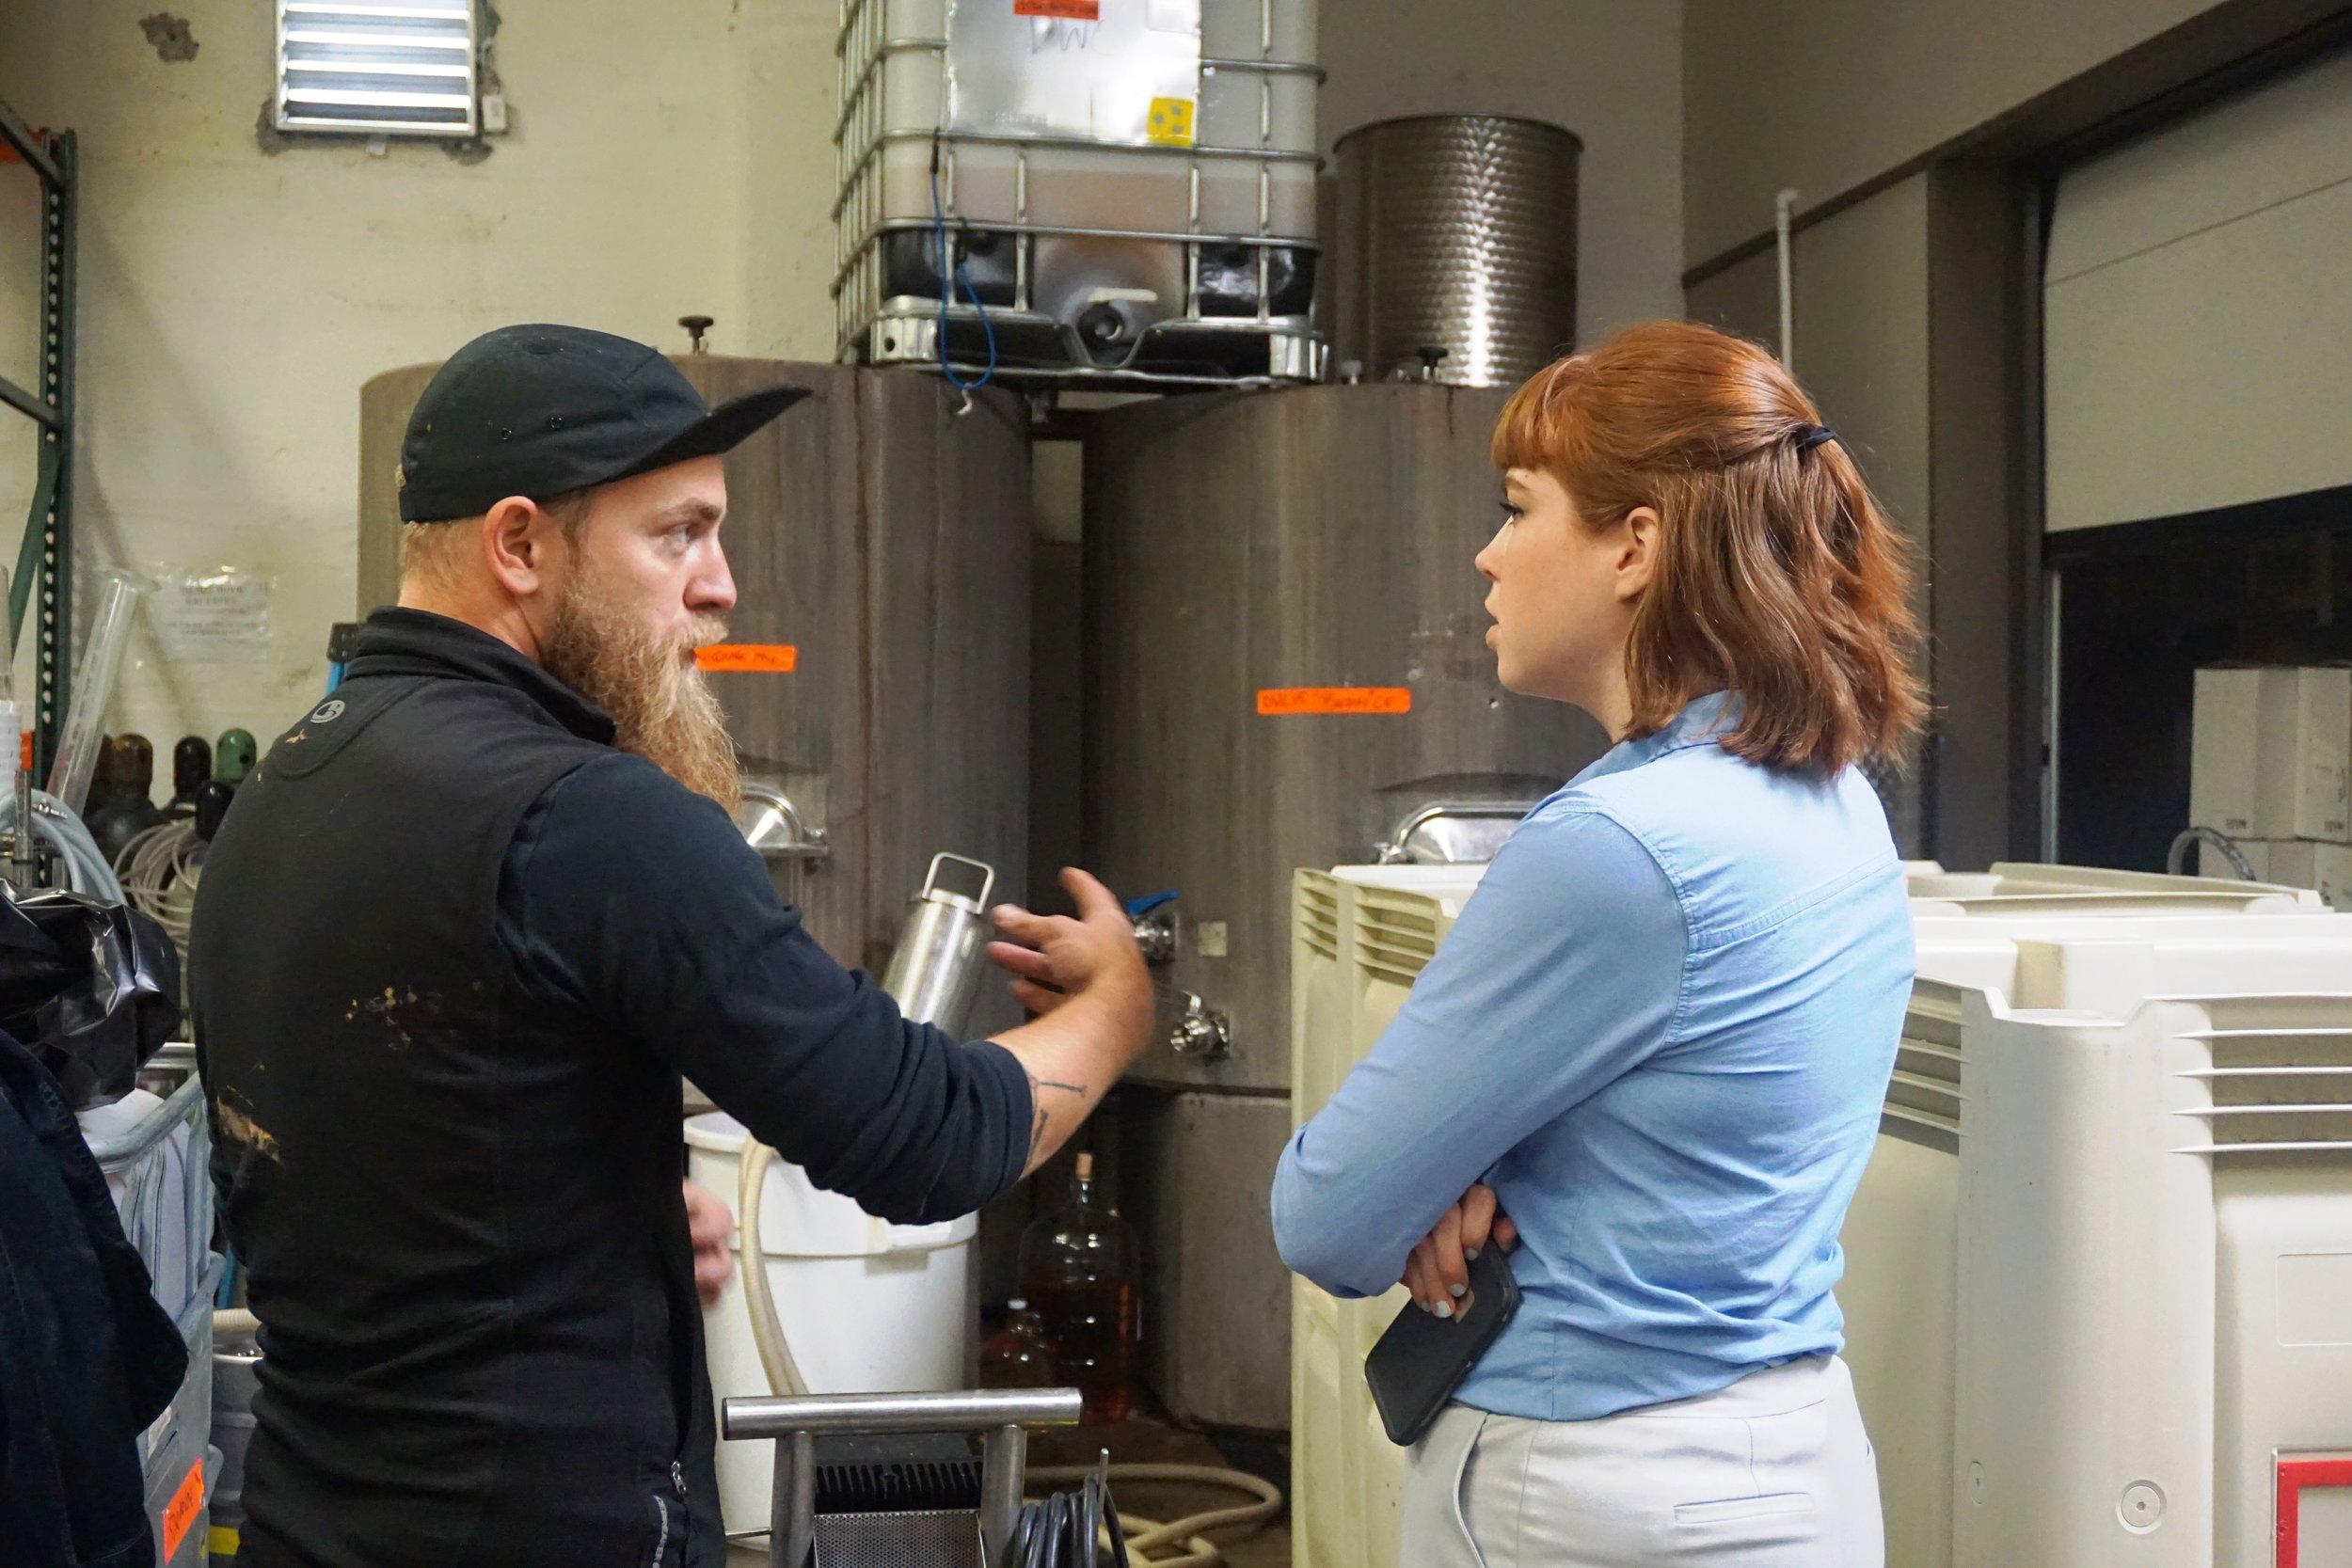 Luke Mathews, winery marketing & wine club specialist at SE Wine Collective, explains the concept of concrete fermenters to Jordan Johnson of Broussard Communications. Viki Eierdam